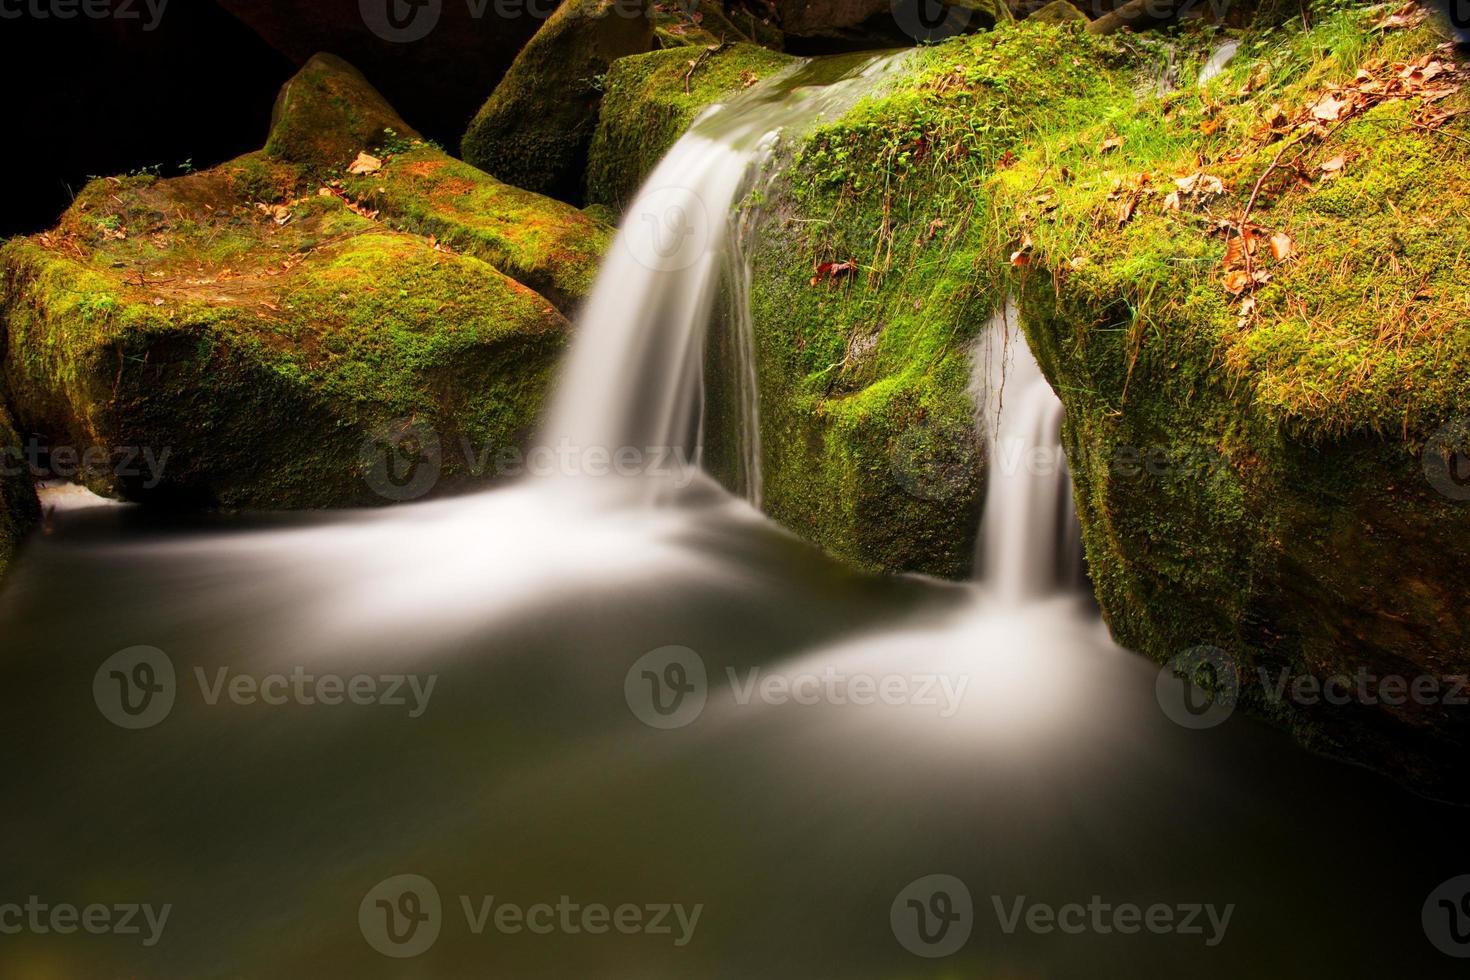 Berg rivier. koud kristalhelder water valt over basalt bemoste rotsblokken foto